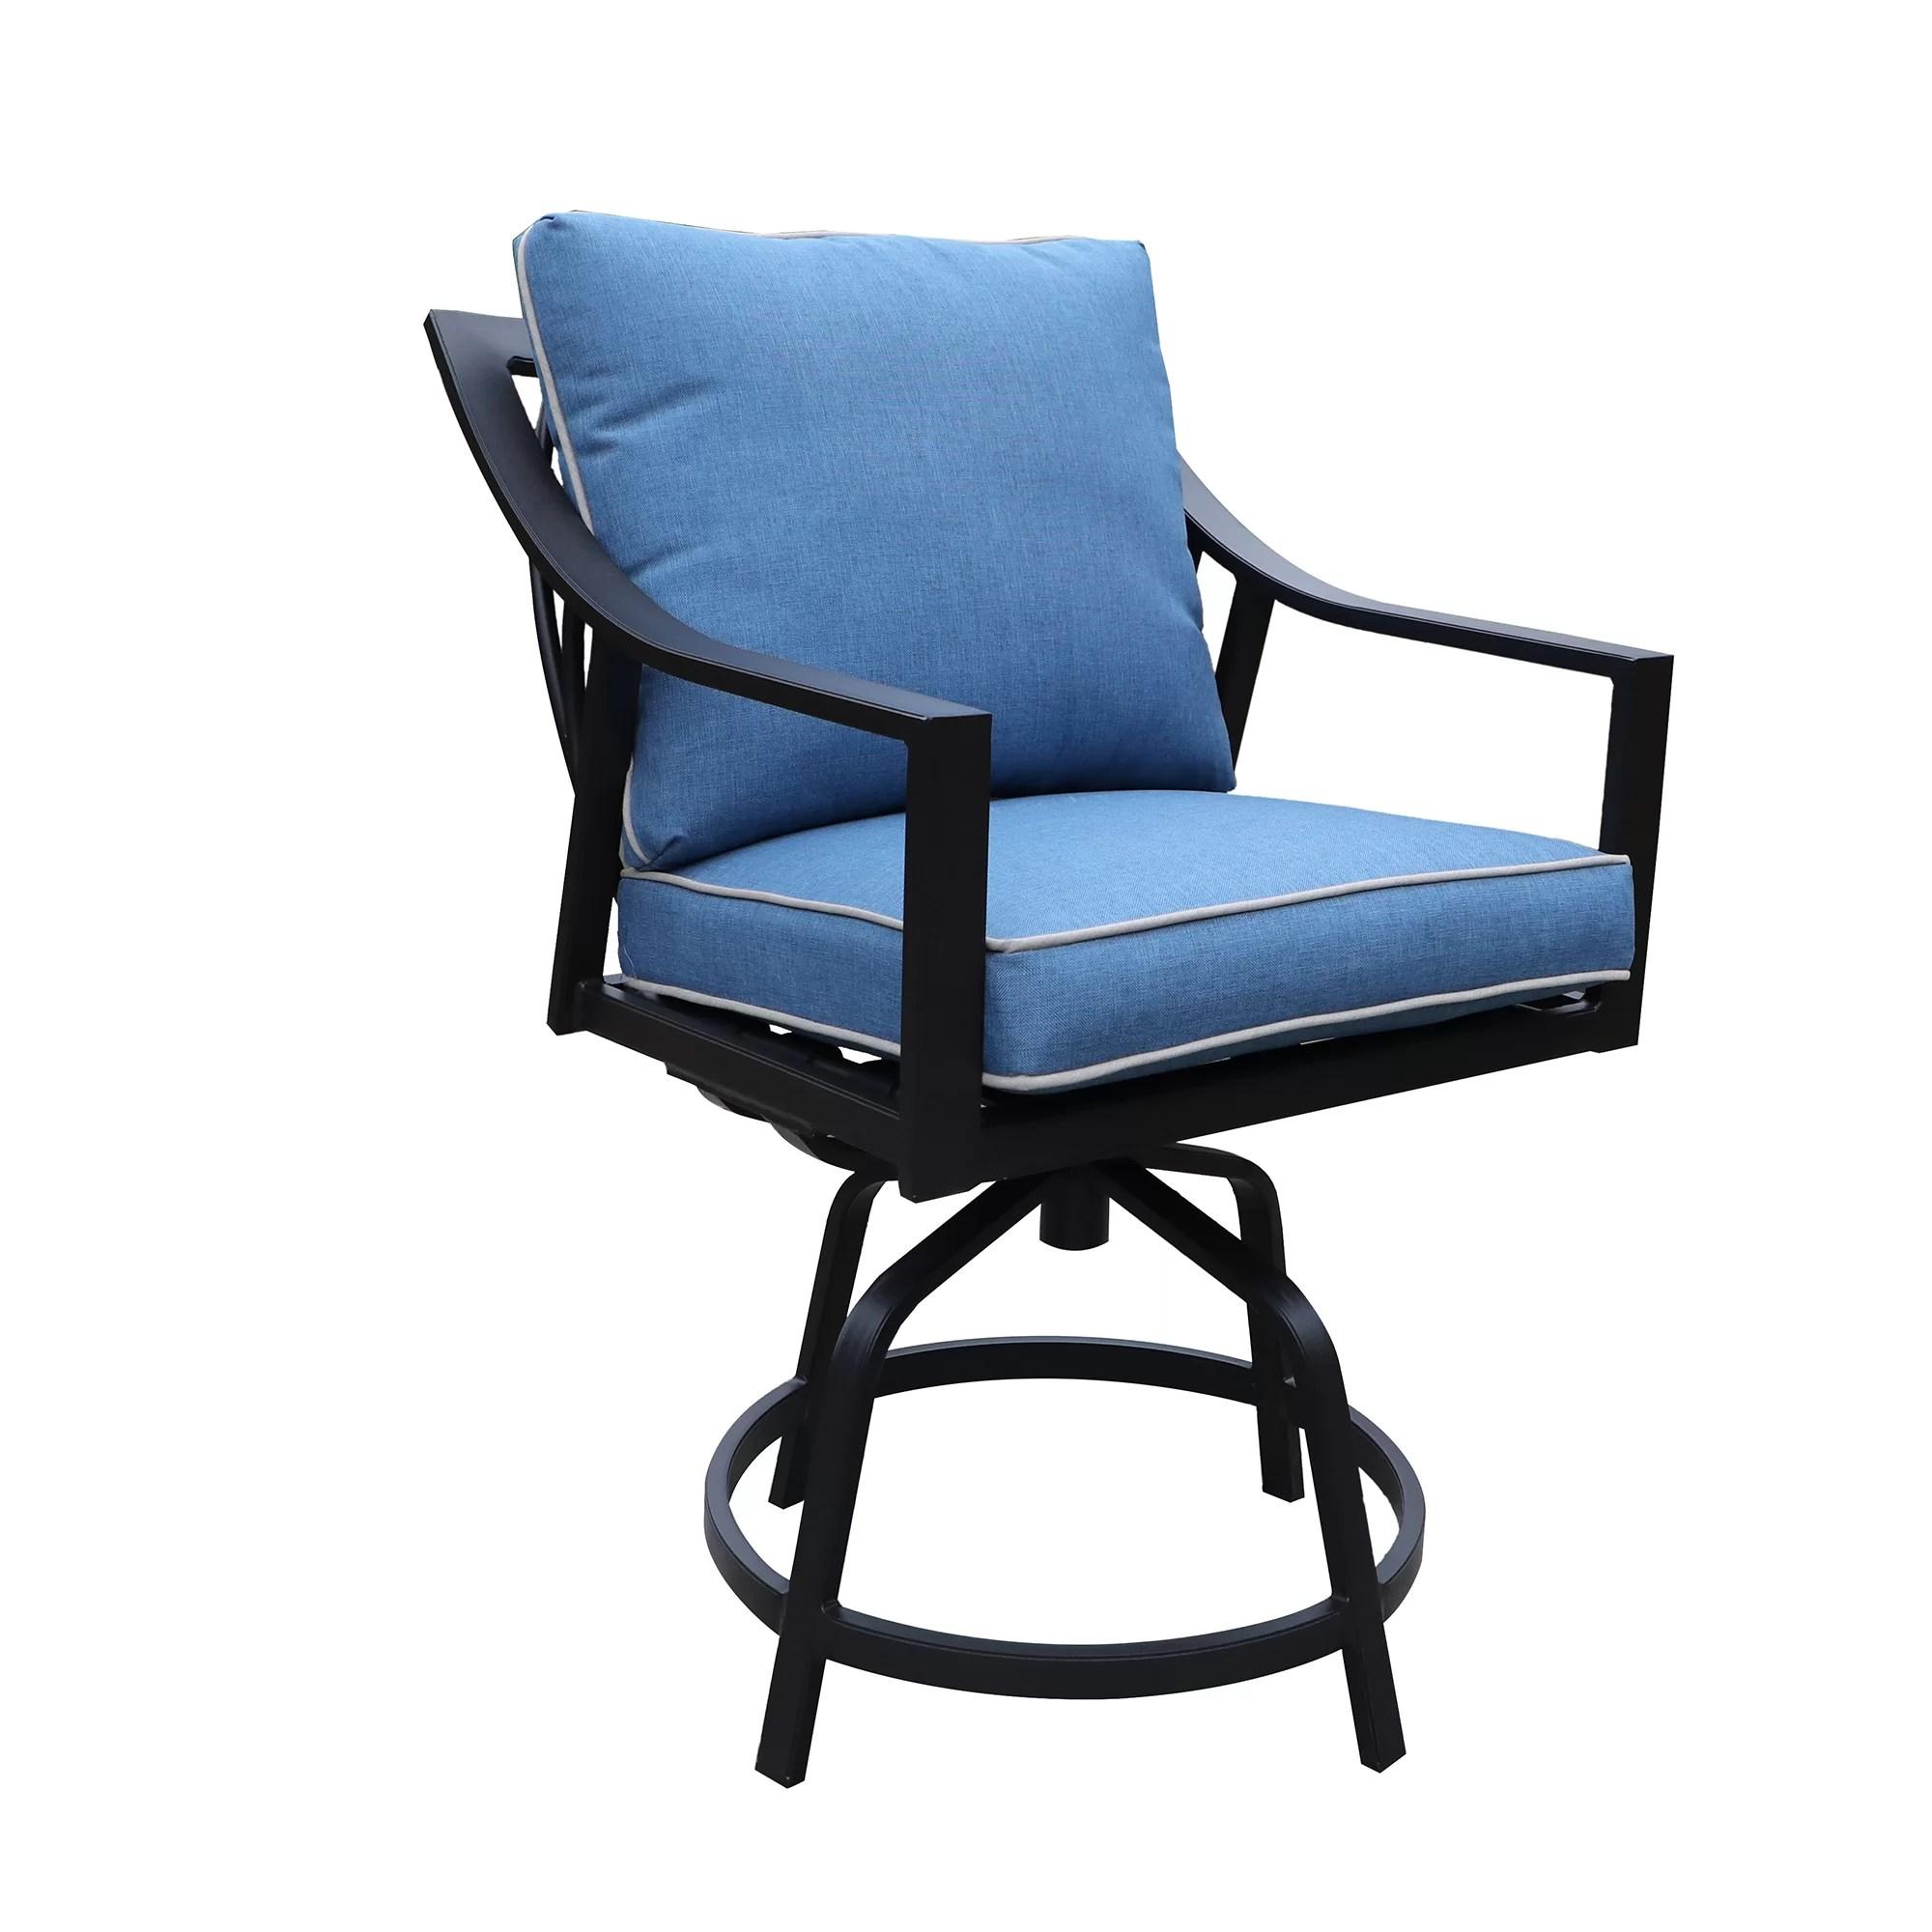 mackinnon outdoor swivel 25 patio bar stool with cushion